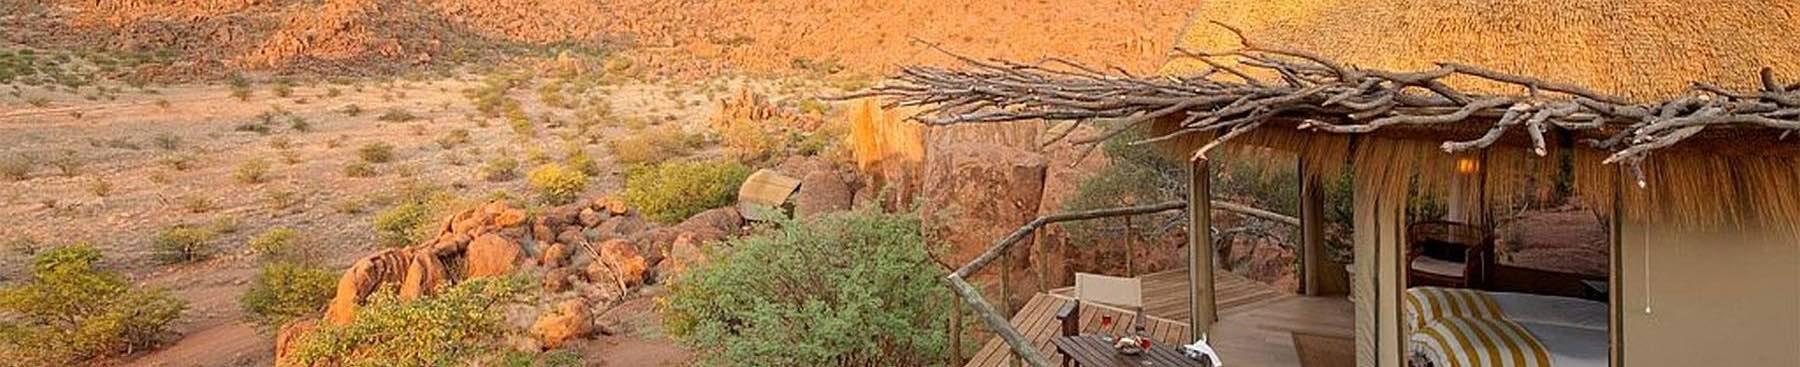 MOWANI MOUNTAIN CAMP – LUXUS LODGE